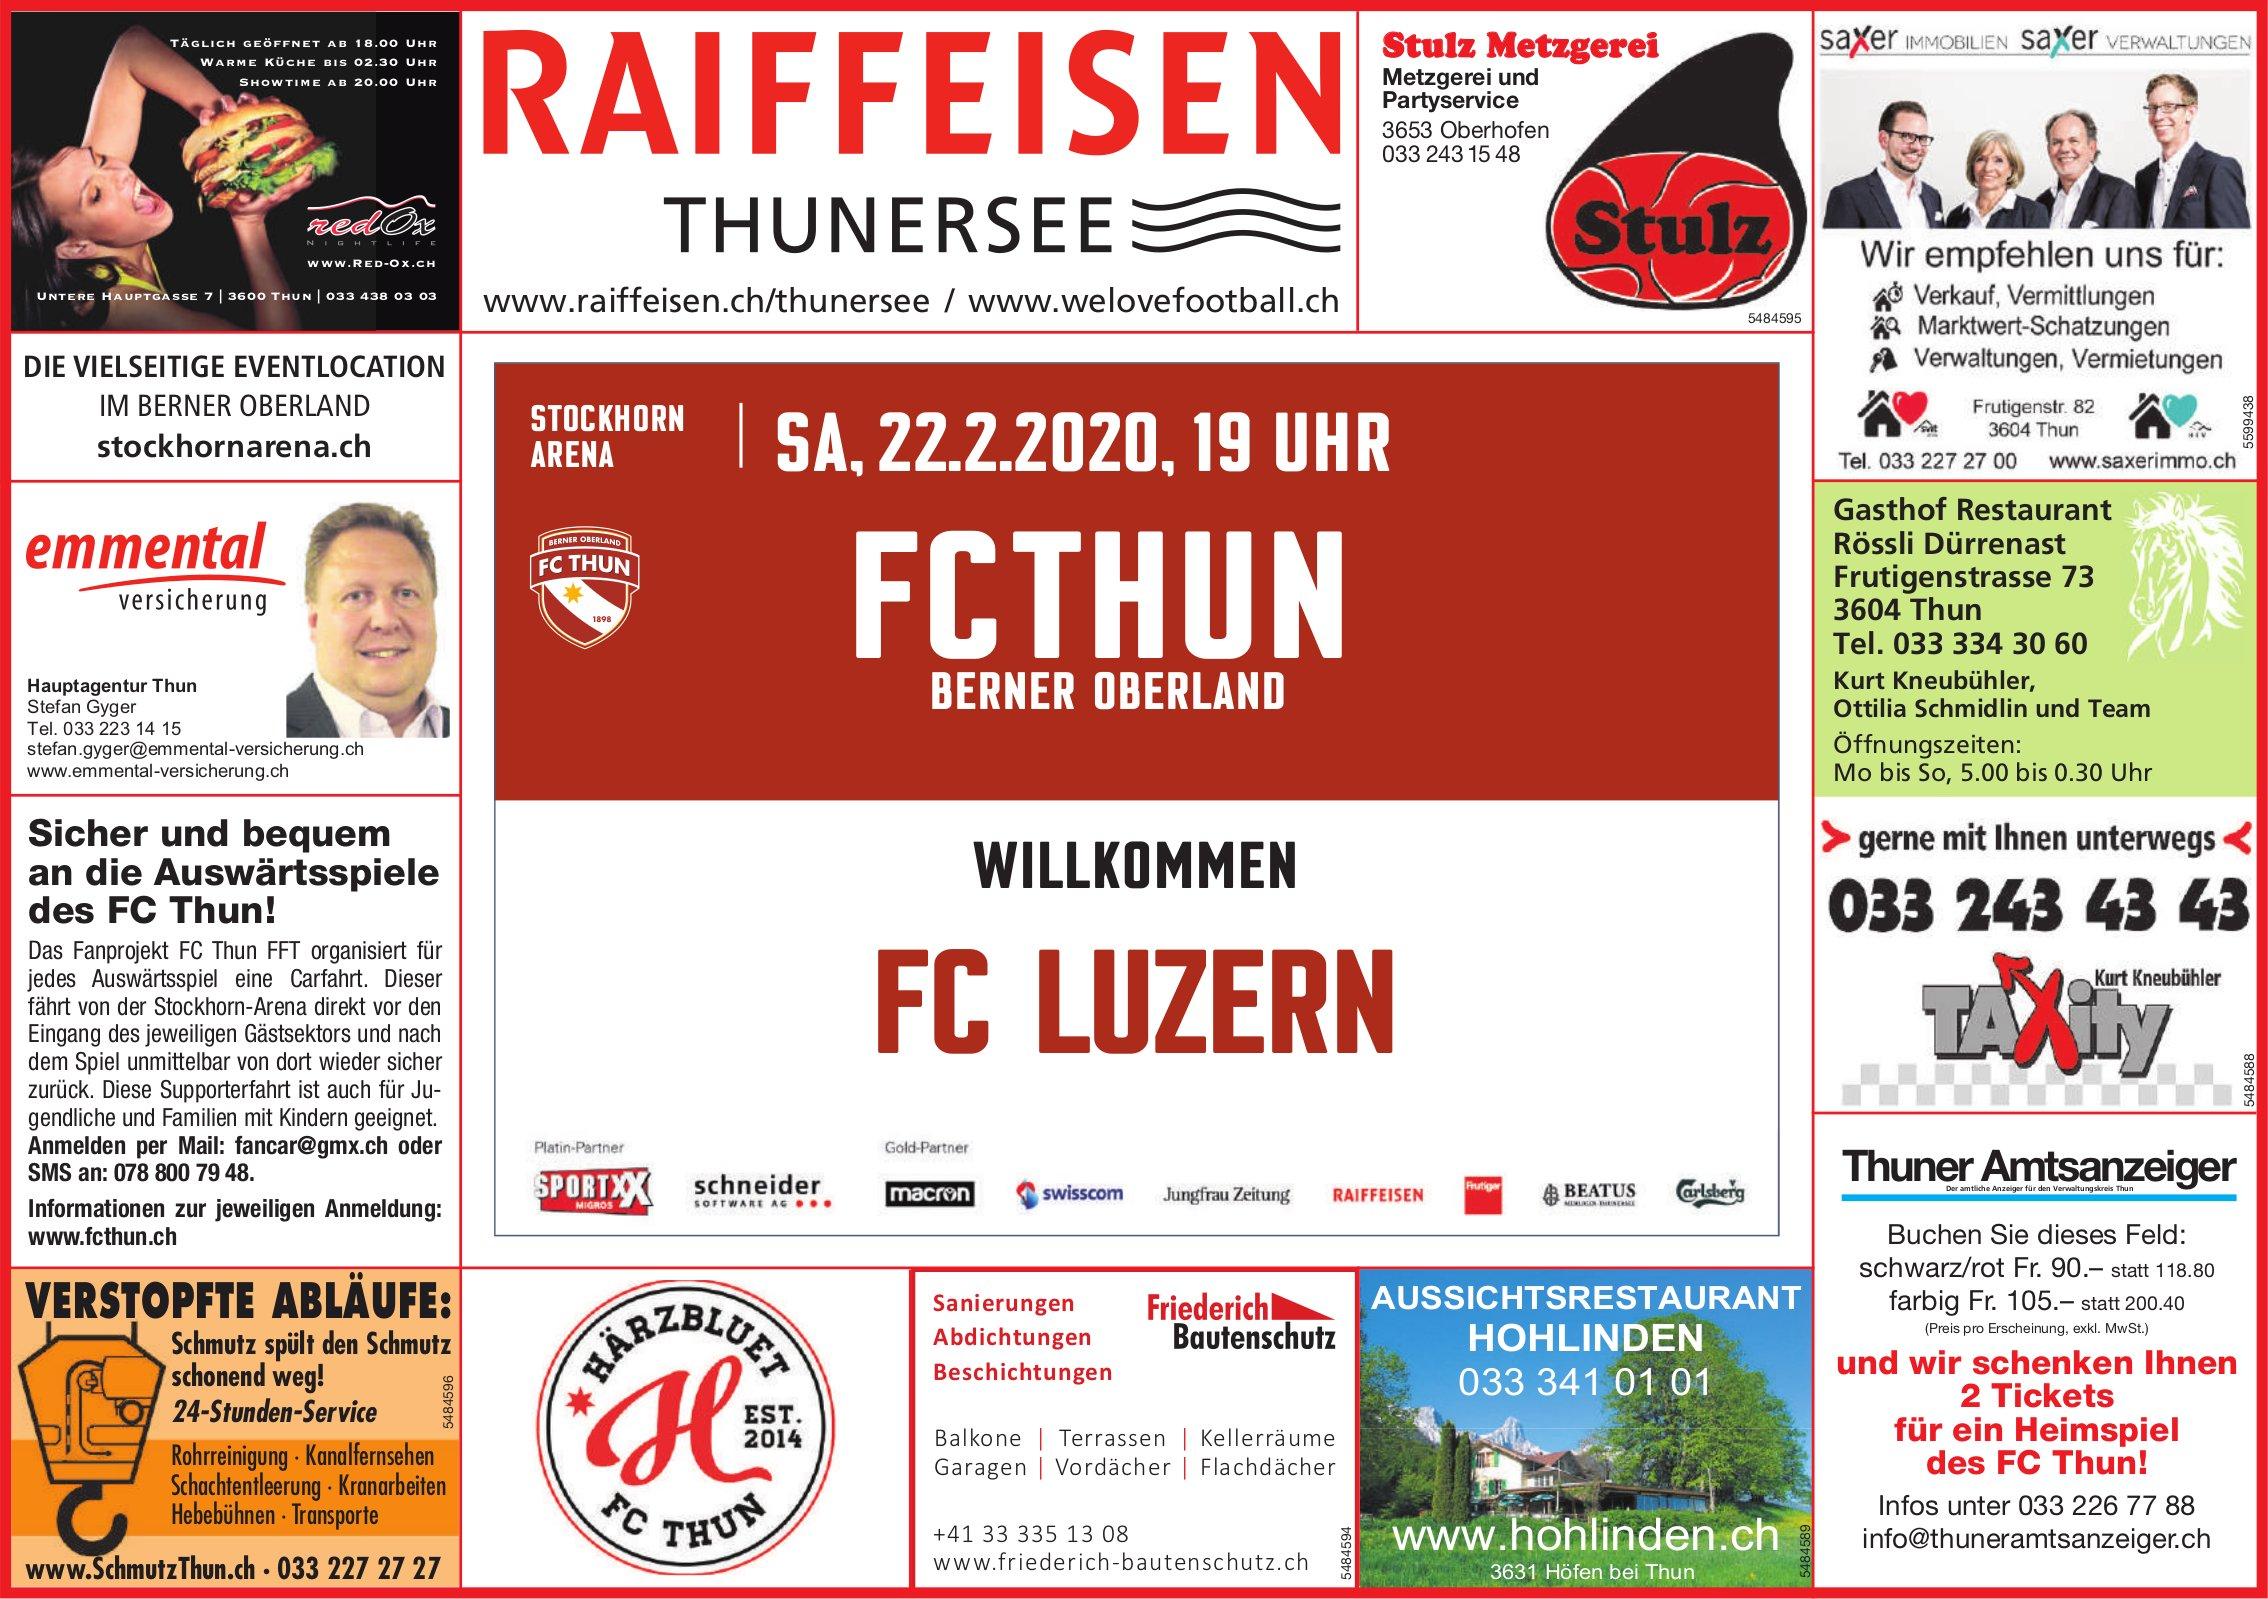 FC Thun Berner Oberland willkommen FC Luzern am 22. Februar